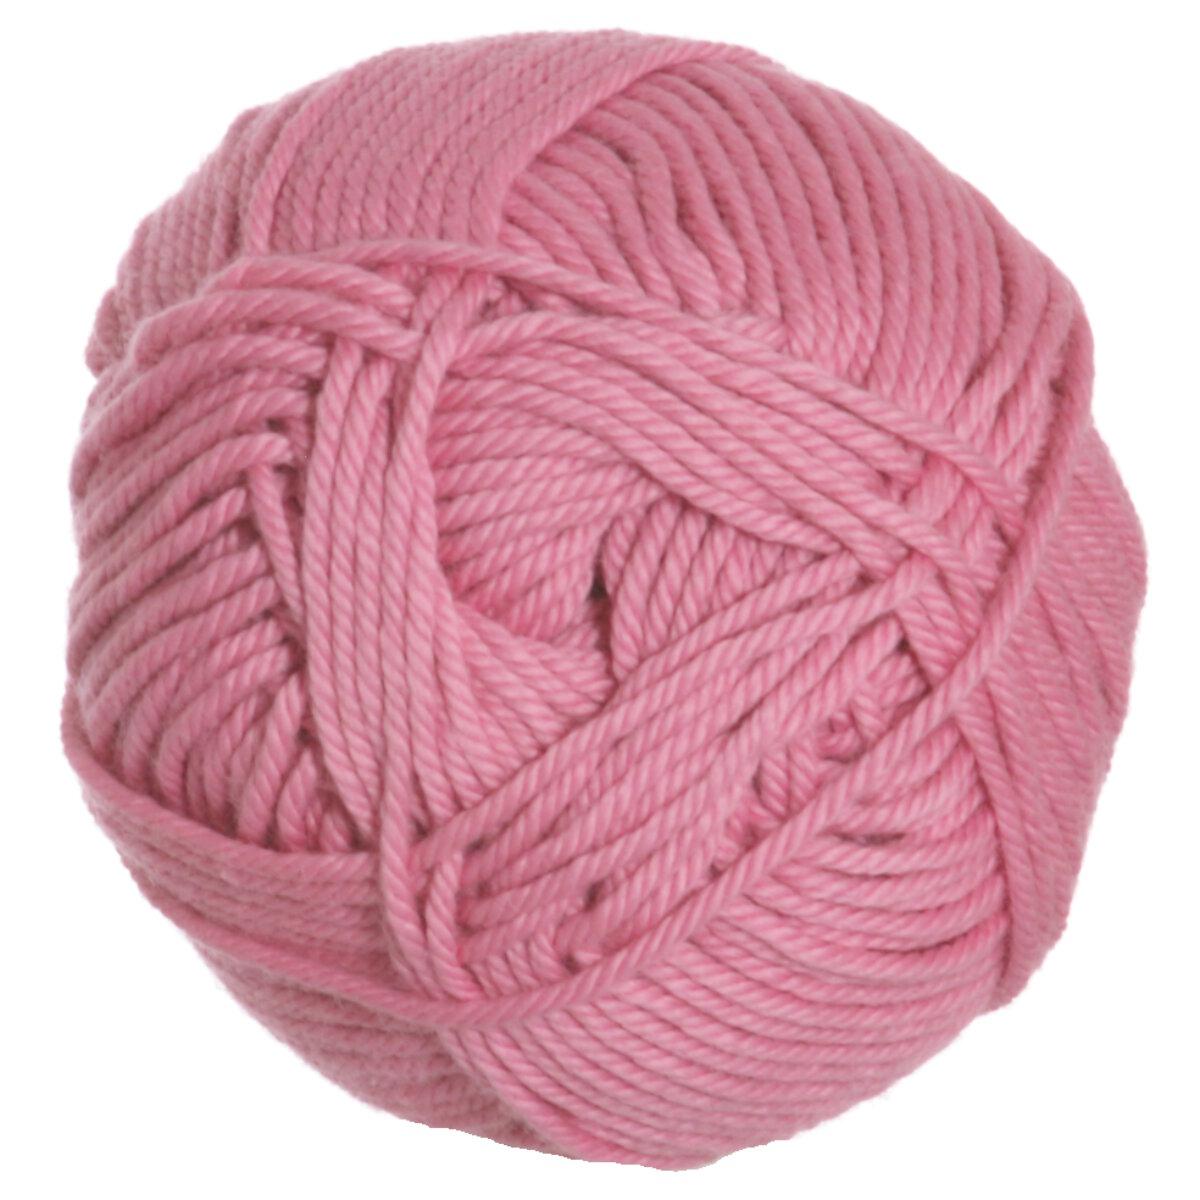 Knitting Patterns Rowan Wool Cotton : Rowan Handknit Cotton Yarn - 303 Sugar at Jimmy Beans Wool